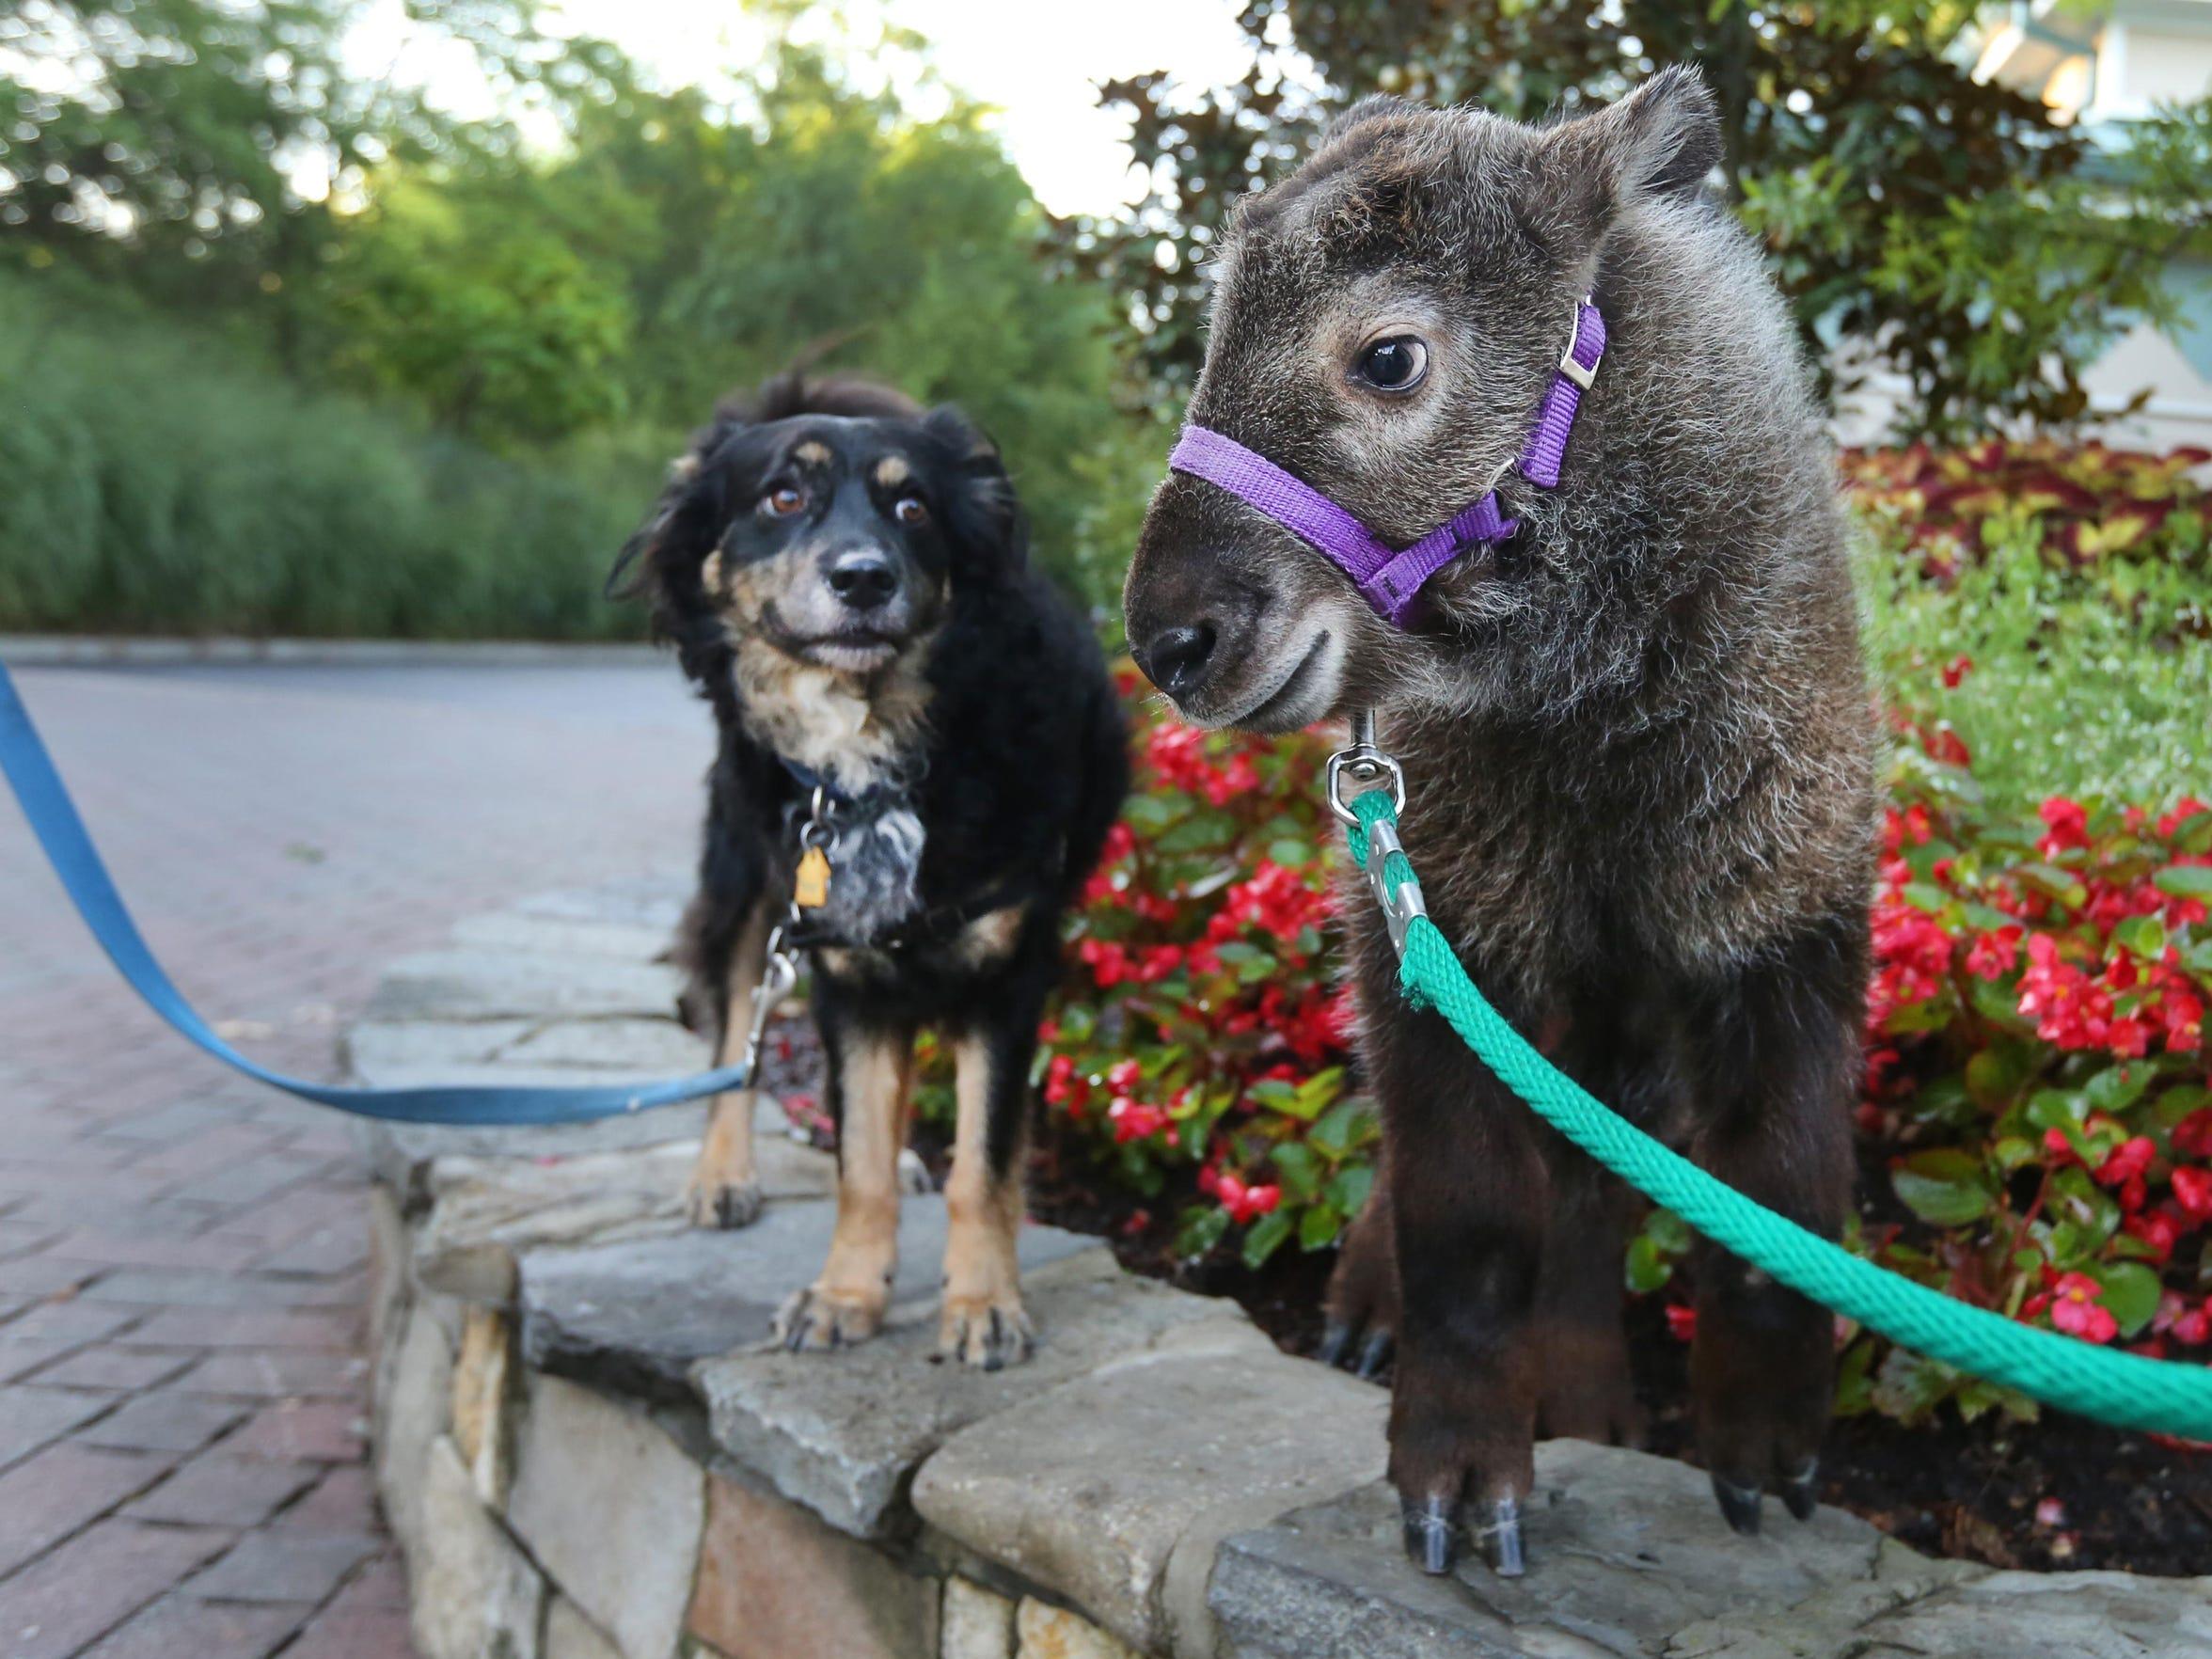 July 20, 2015. Zoo, nanny, takin, dog, Liz Dufour